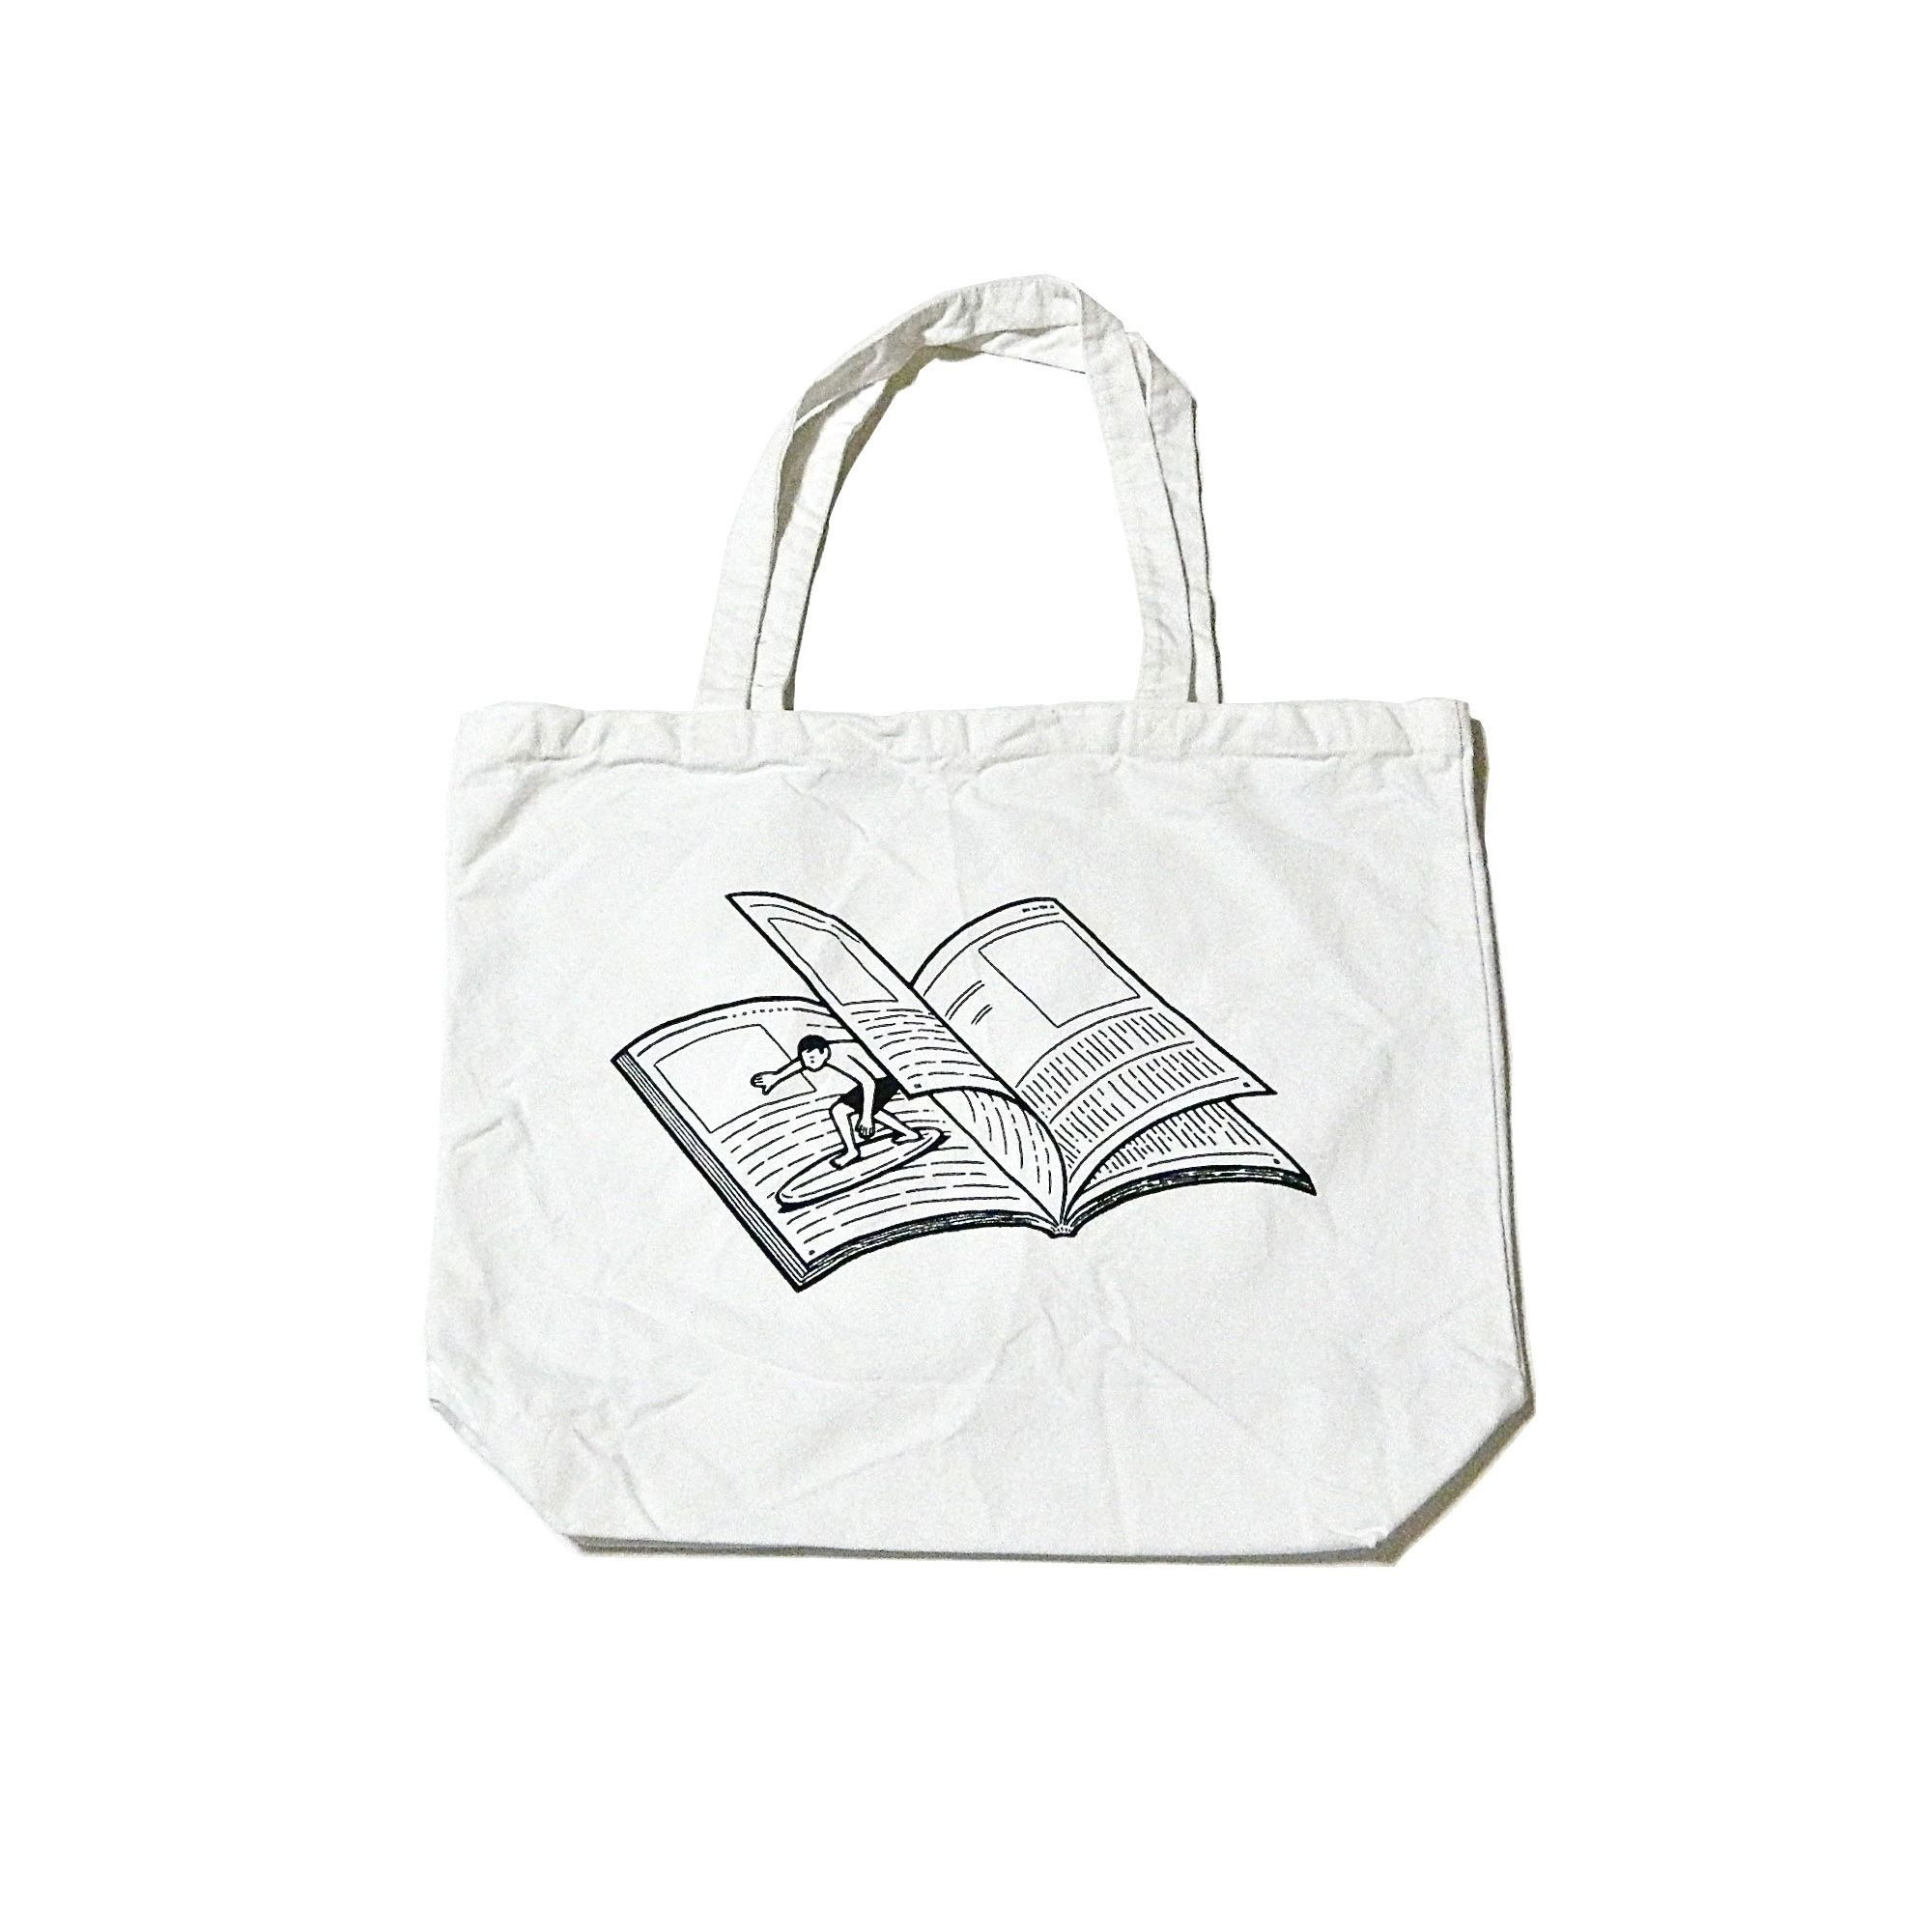 Tote bag template illustrator - Noritake Tote Bag Magazine Wave